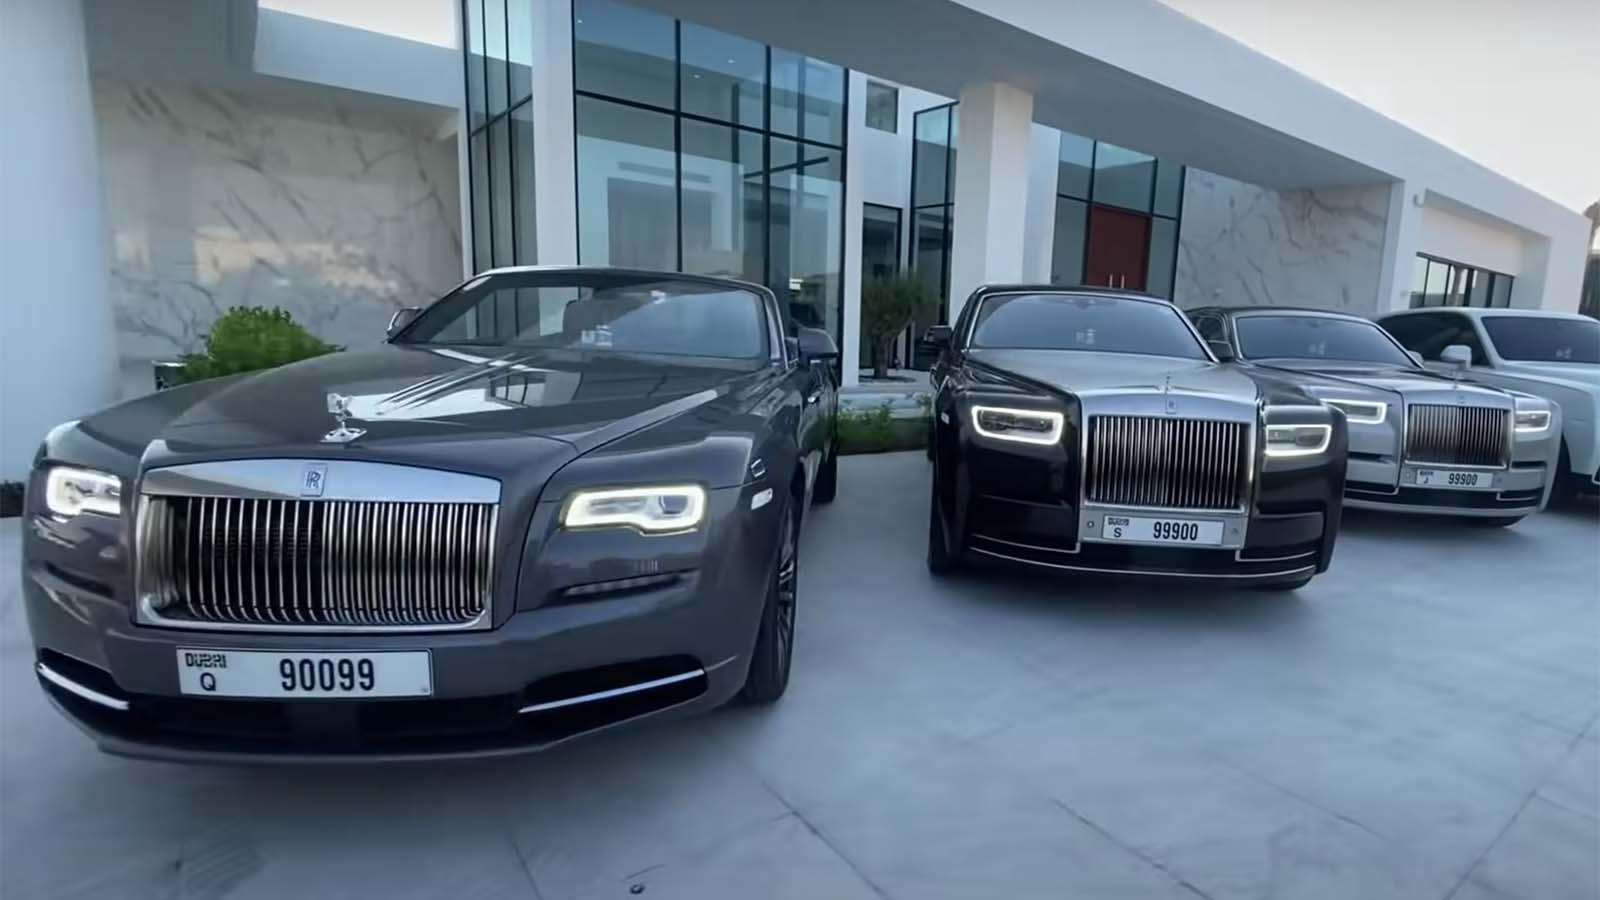 Dubai Rolls Royce Collection